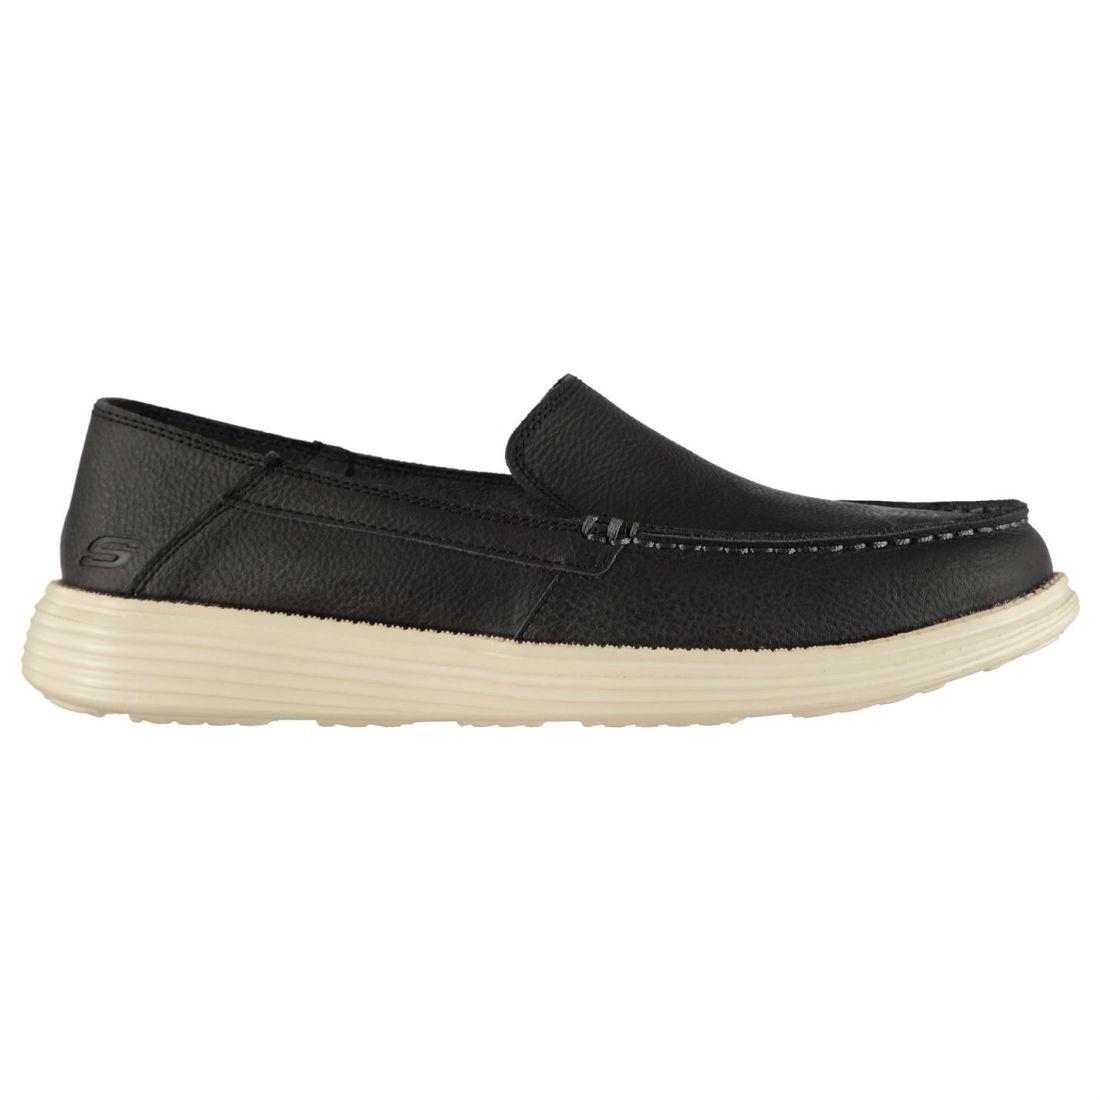 Skechers Status Breson Everyday Shoes Mens Gents Slip On